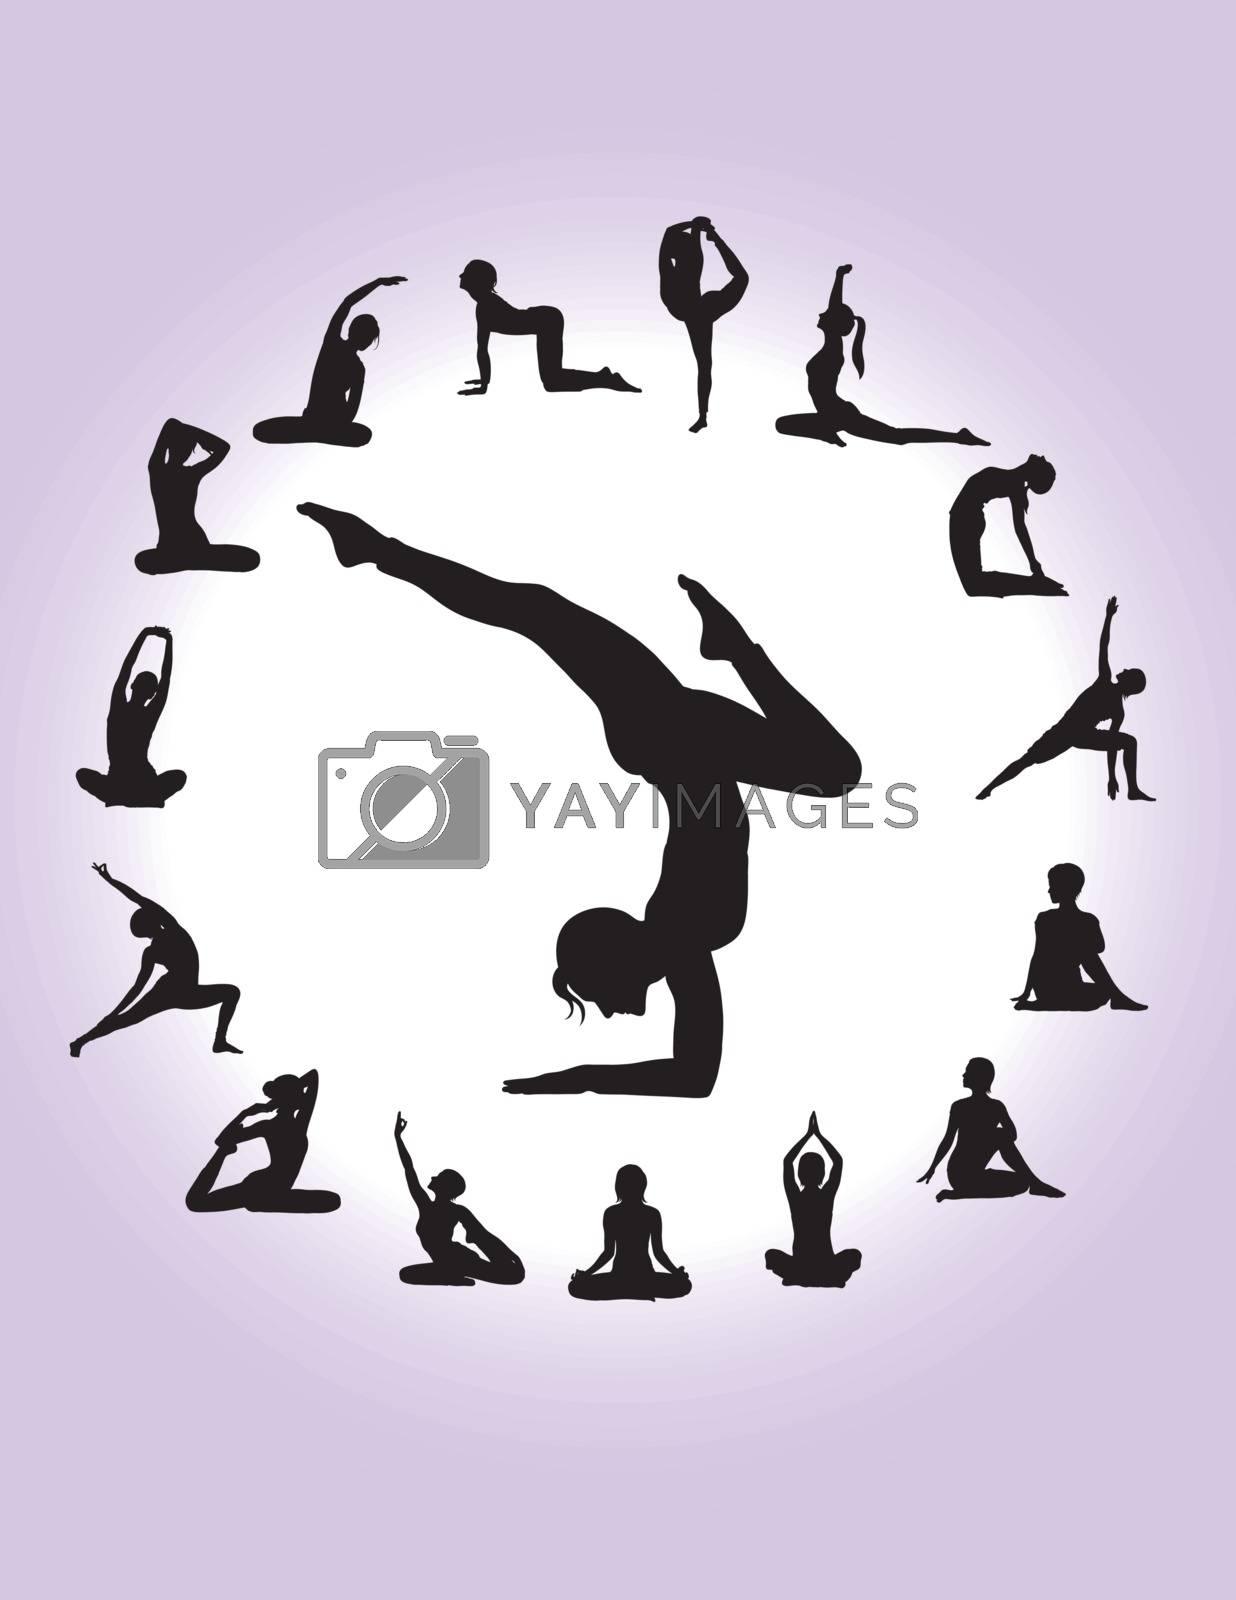 Yoga Silhouettes, art vector design